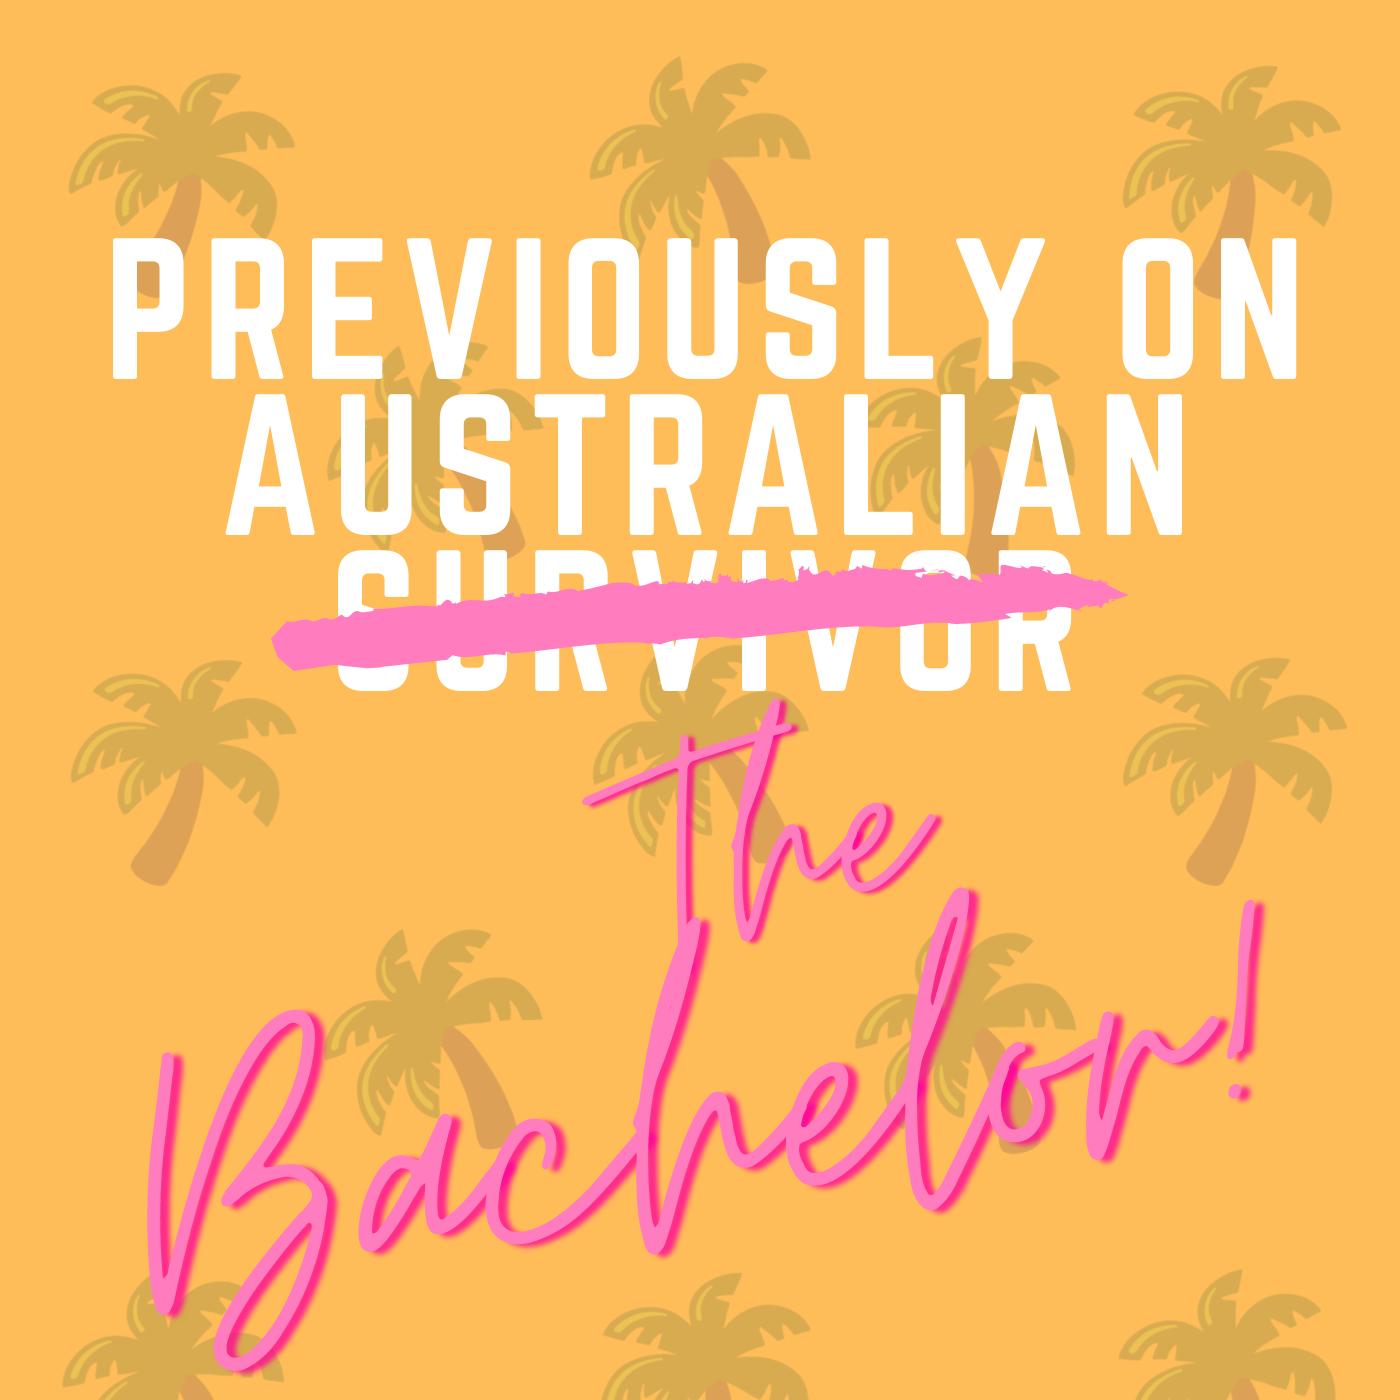 Previously on... Australian Survivor show art